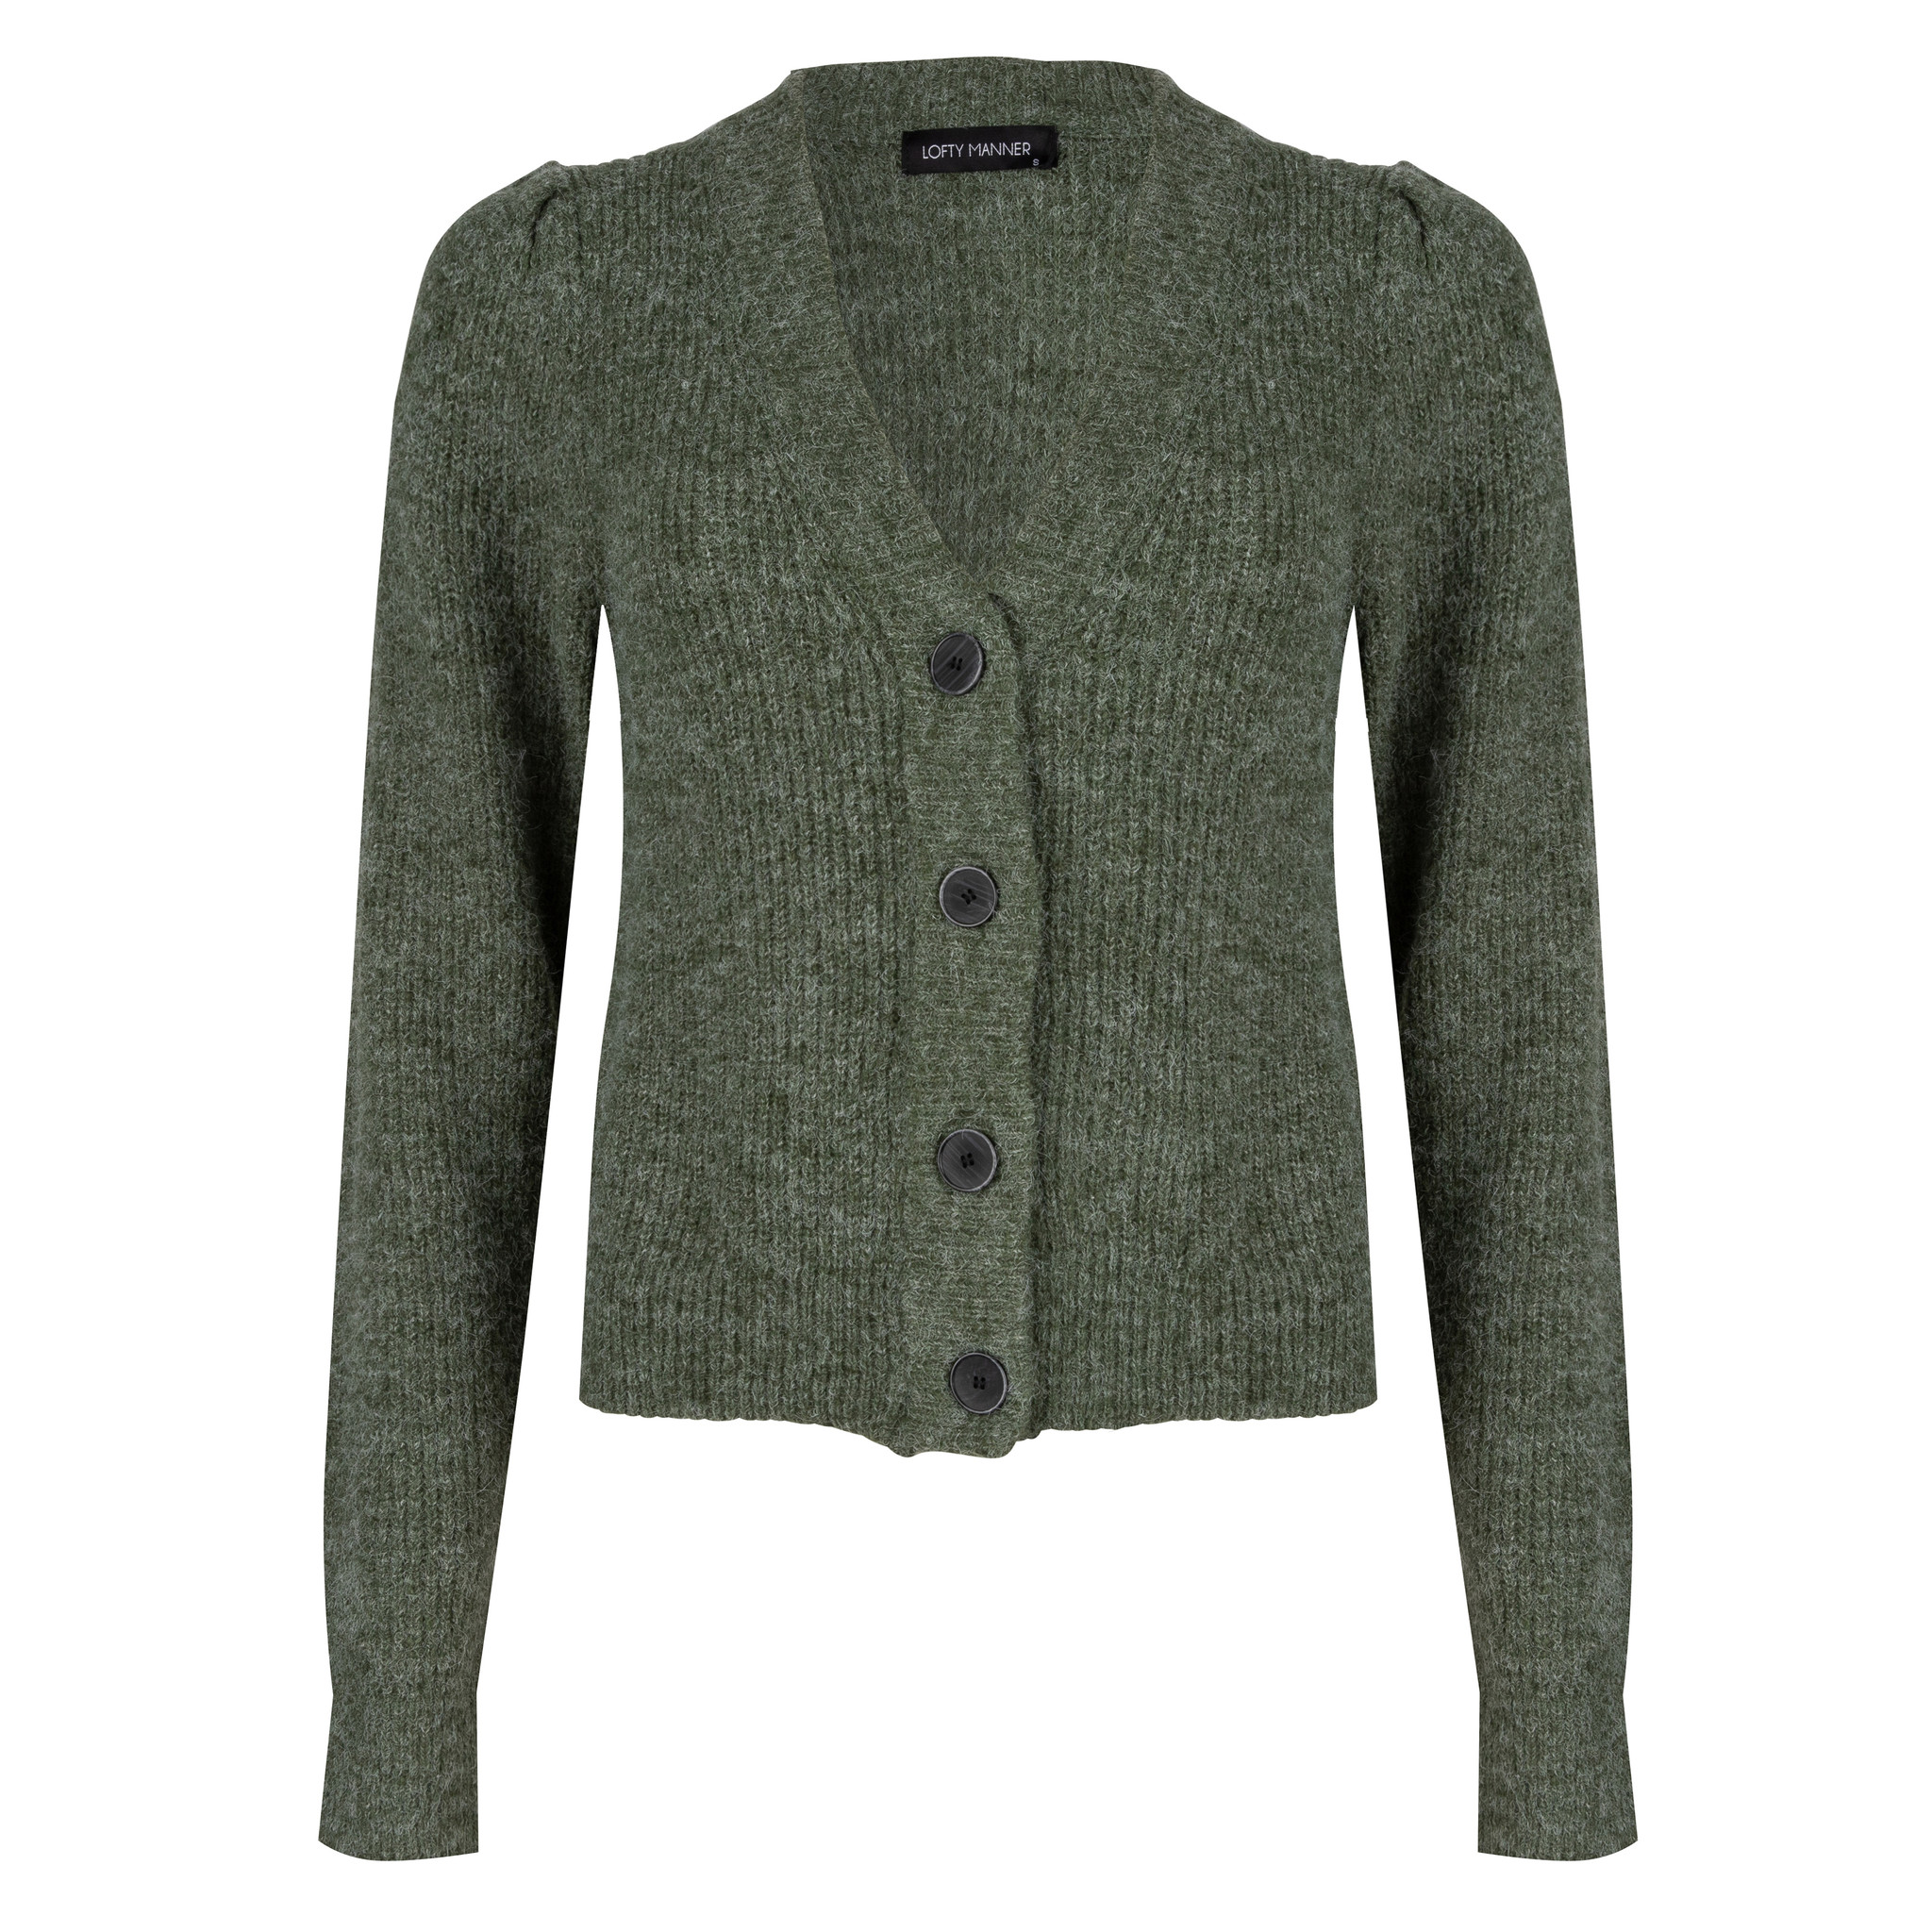 Lofty Manner Groen Gebreid Vest Daphne